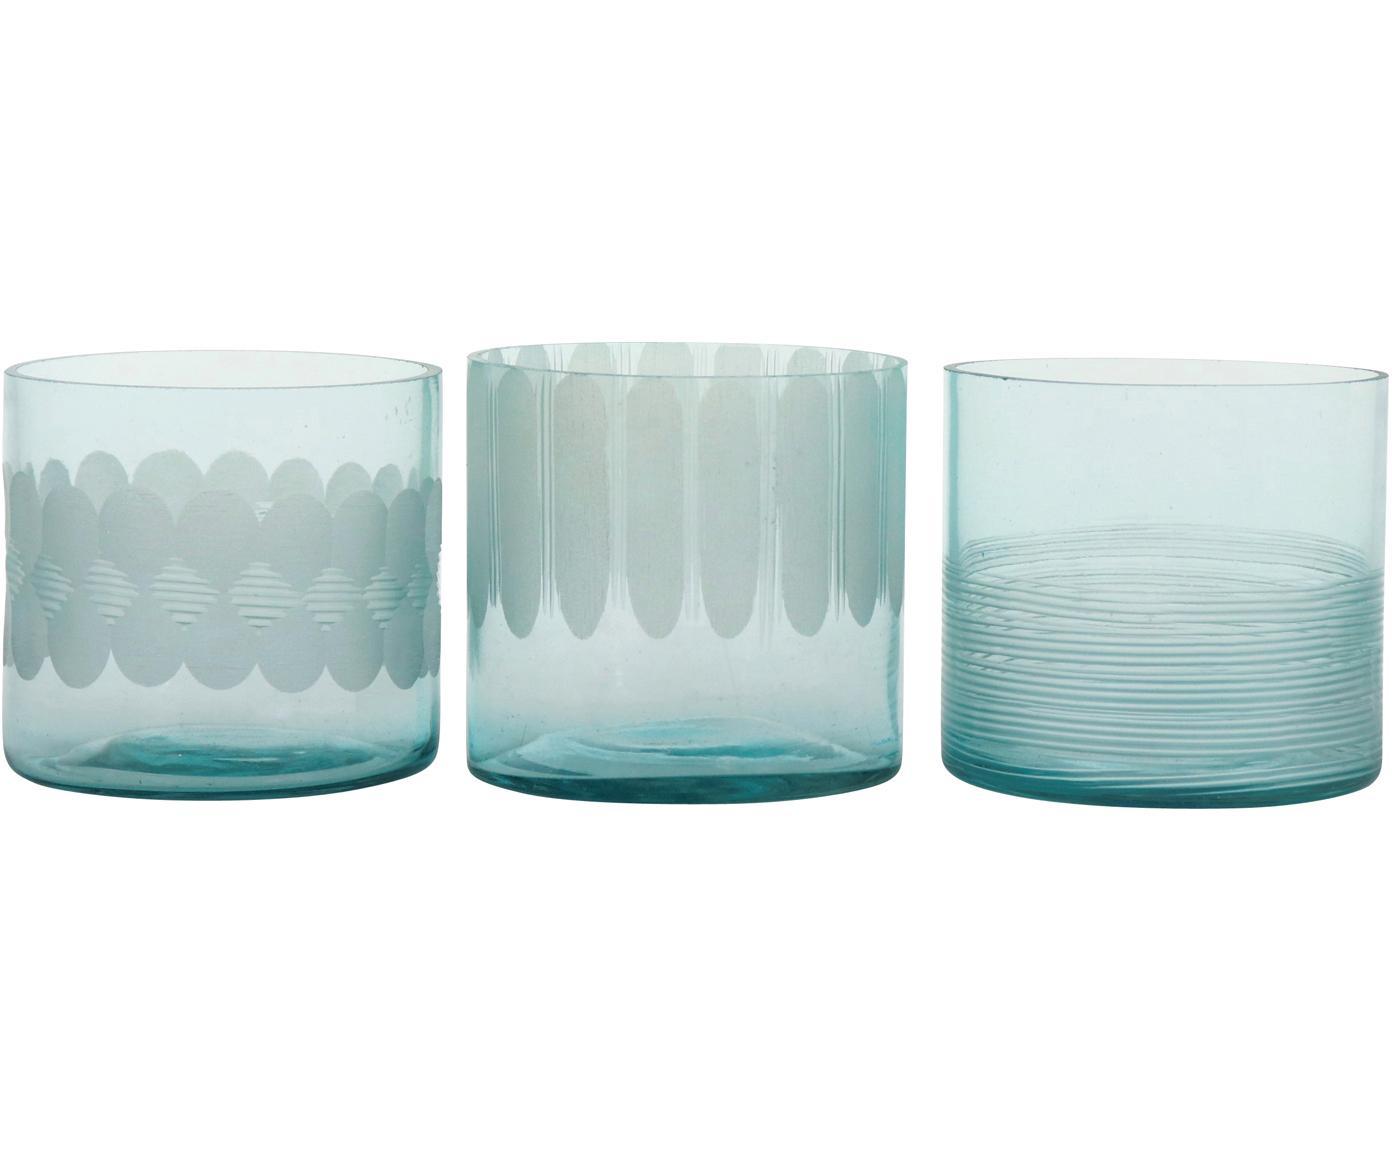 Windlichter-Set Cosmopol, 3-tlg., Glas, Blau, Ø 8 x H 8 cm